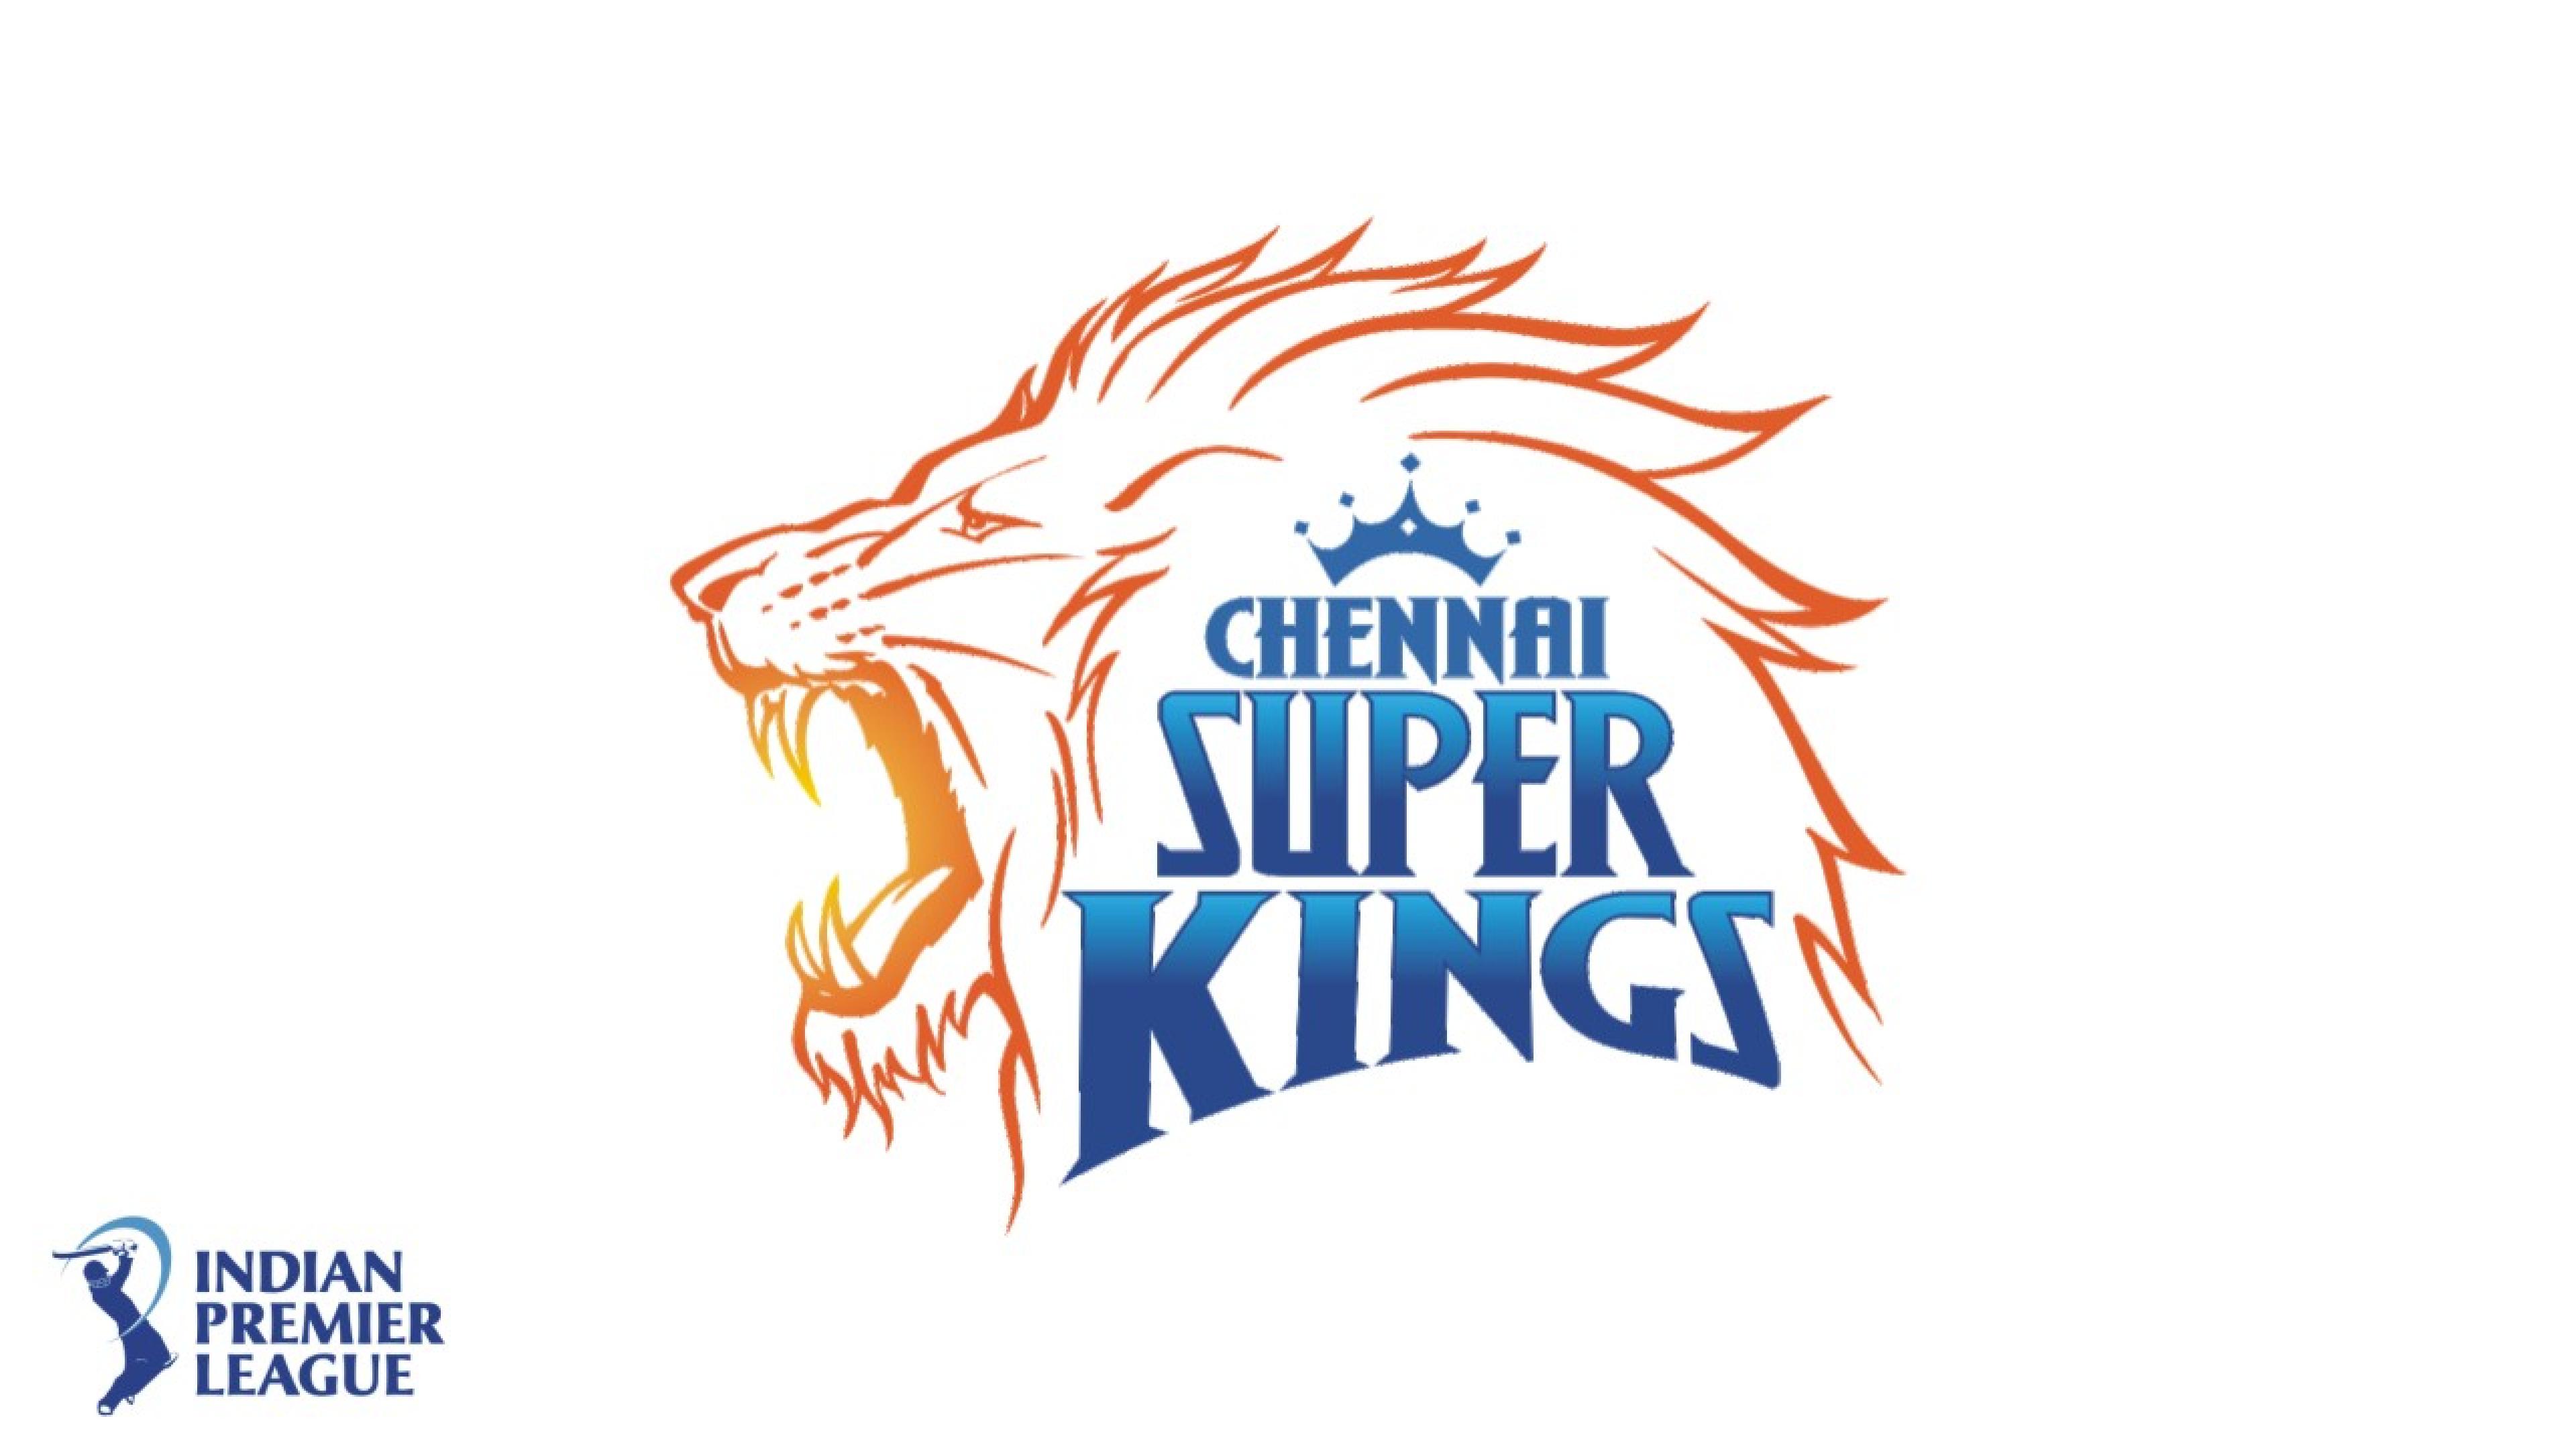 ipl chennai super kings csk team logo white background hd wallpaper